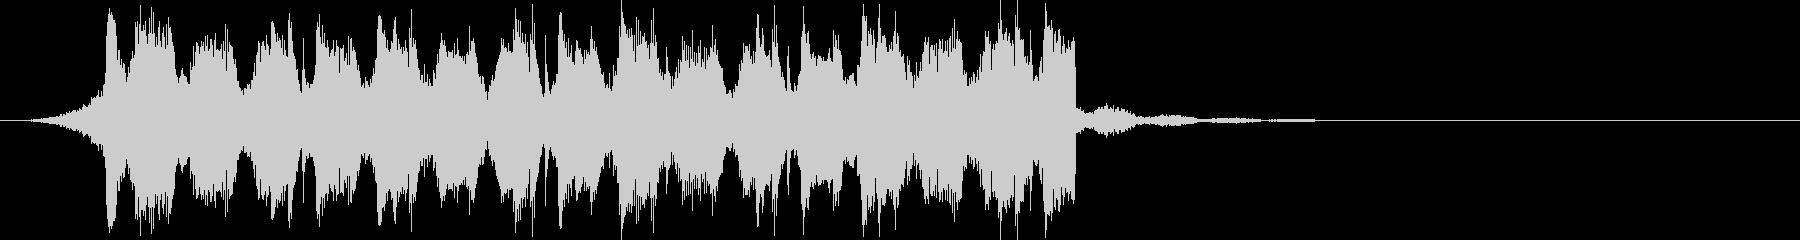 OPEDクールで穏やかな透明感ジングルcの未再生の波形